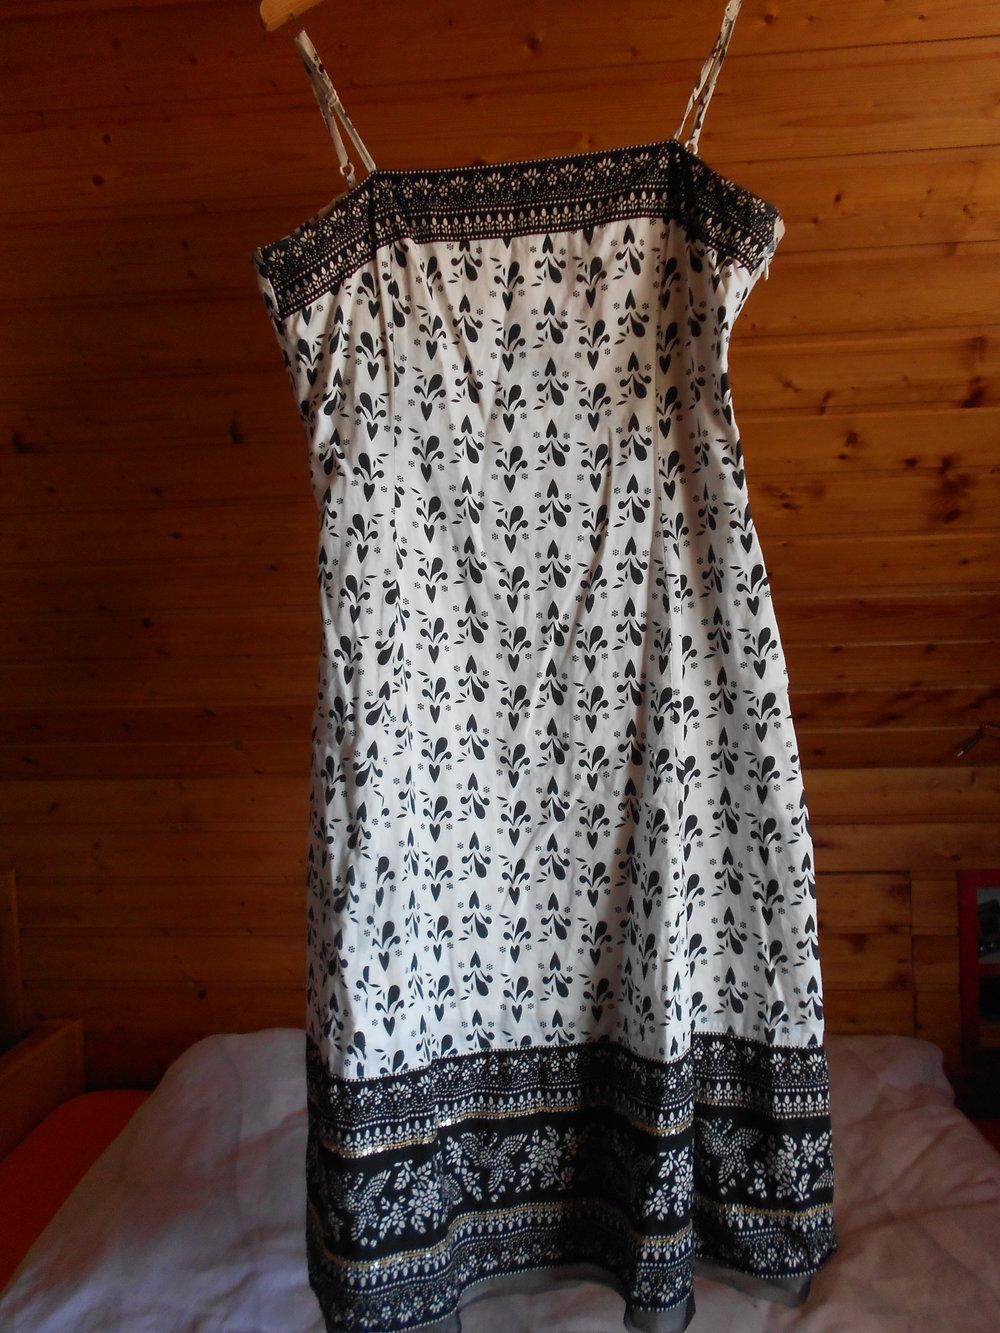 ... Vero Moda 38 Kleid Babydoll Trägerkleid A-Linie Muster Jugendstil Tüll  Glitzer Paisley Jugendstil schwarz ... 4c8fa2693a